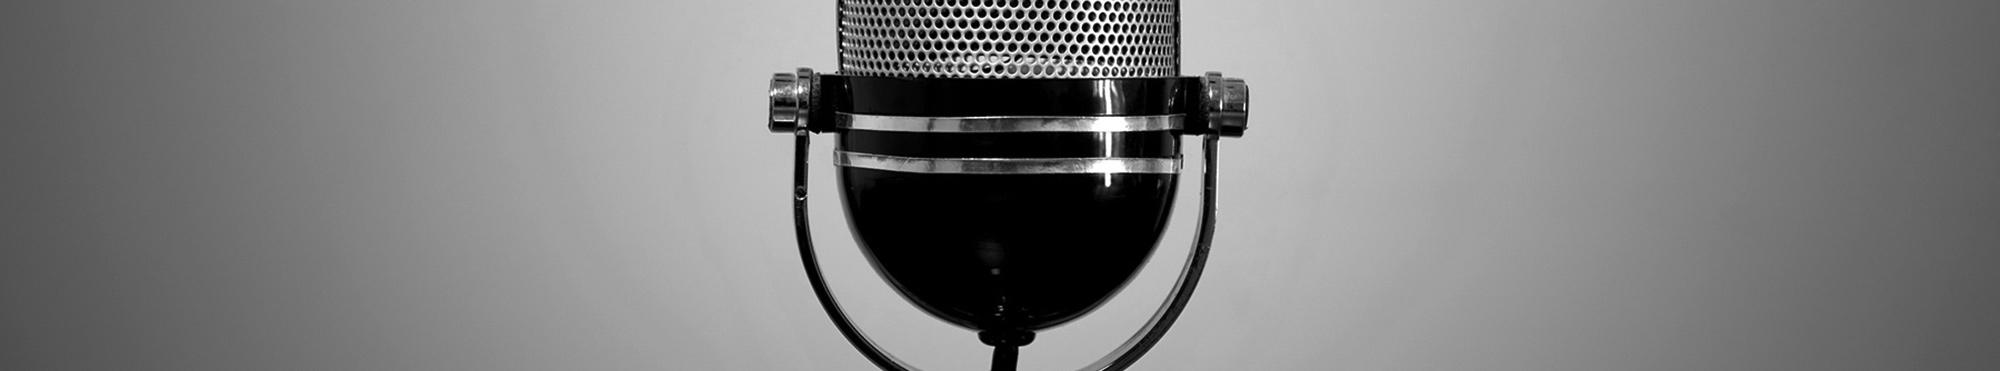 teejay voice-over